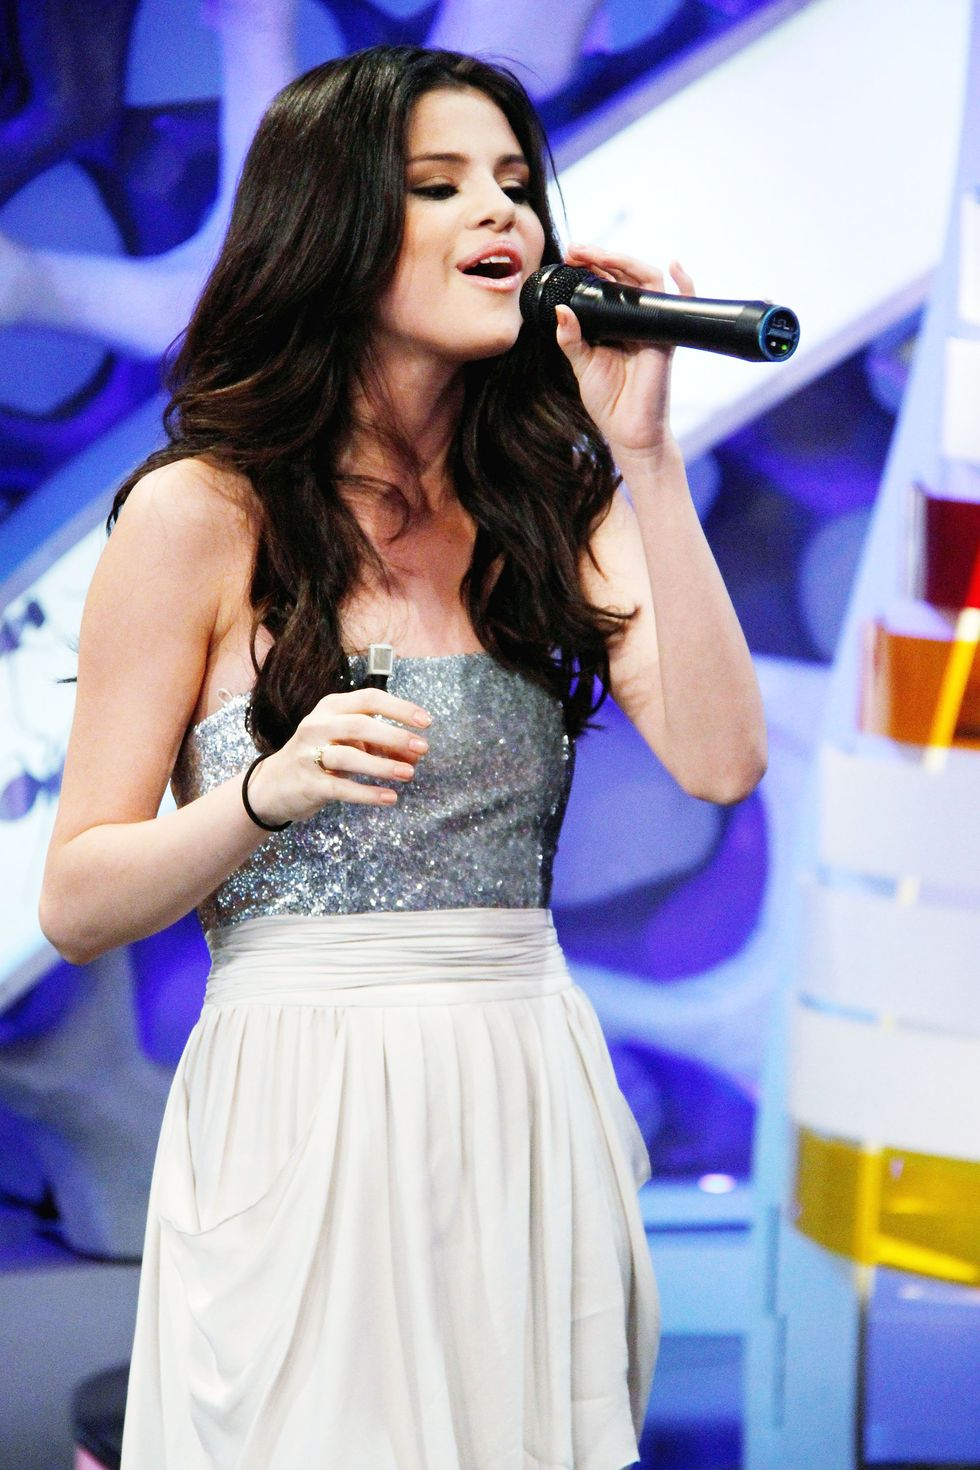 Selena Gomez 2010 : selena-gomez-el-hormiguero-tv-show-stills-hq-06